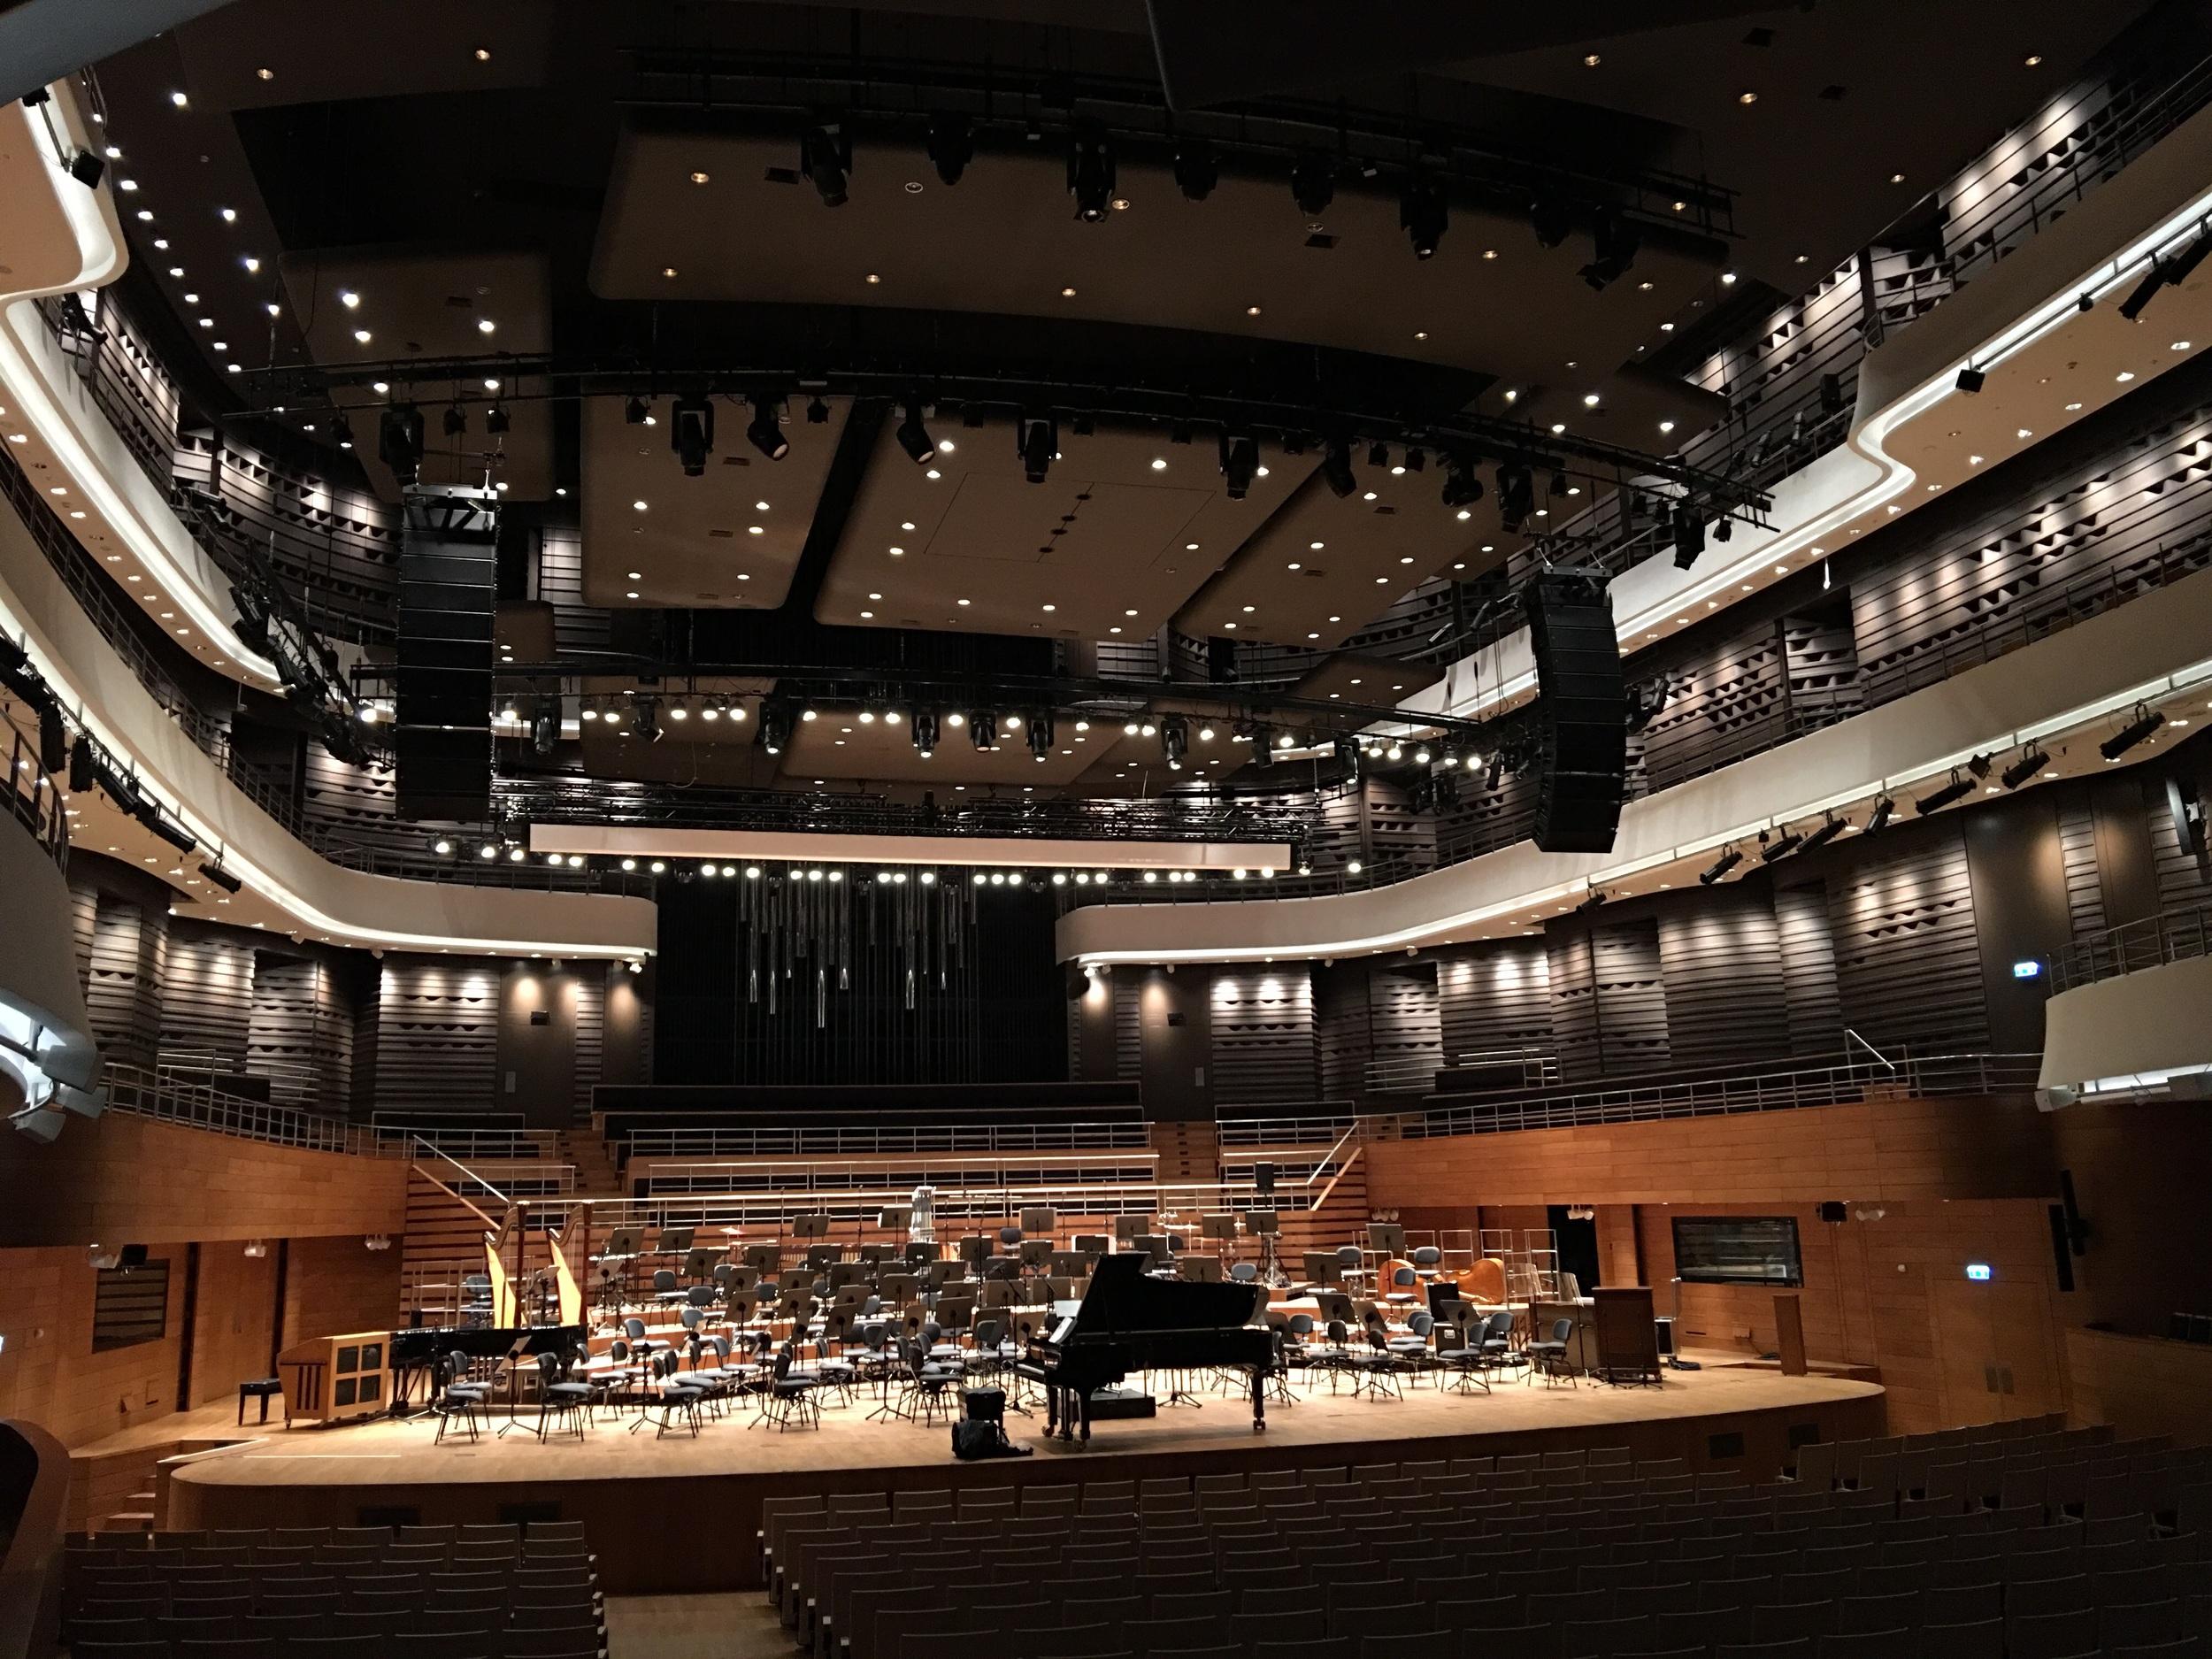 National Forum of Music, Main Hall, Wrocław, Poland